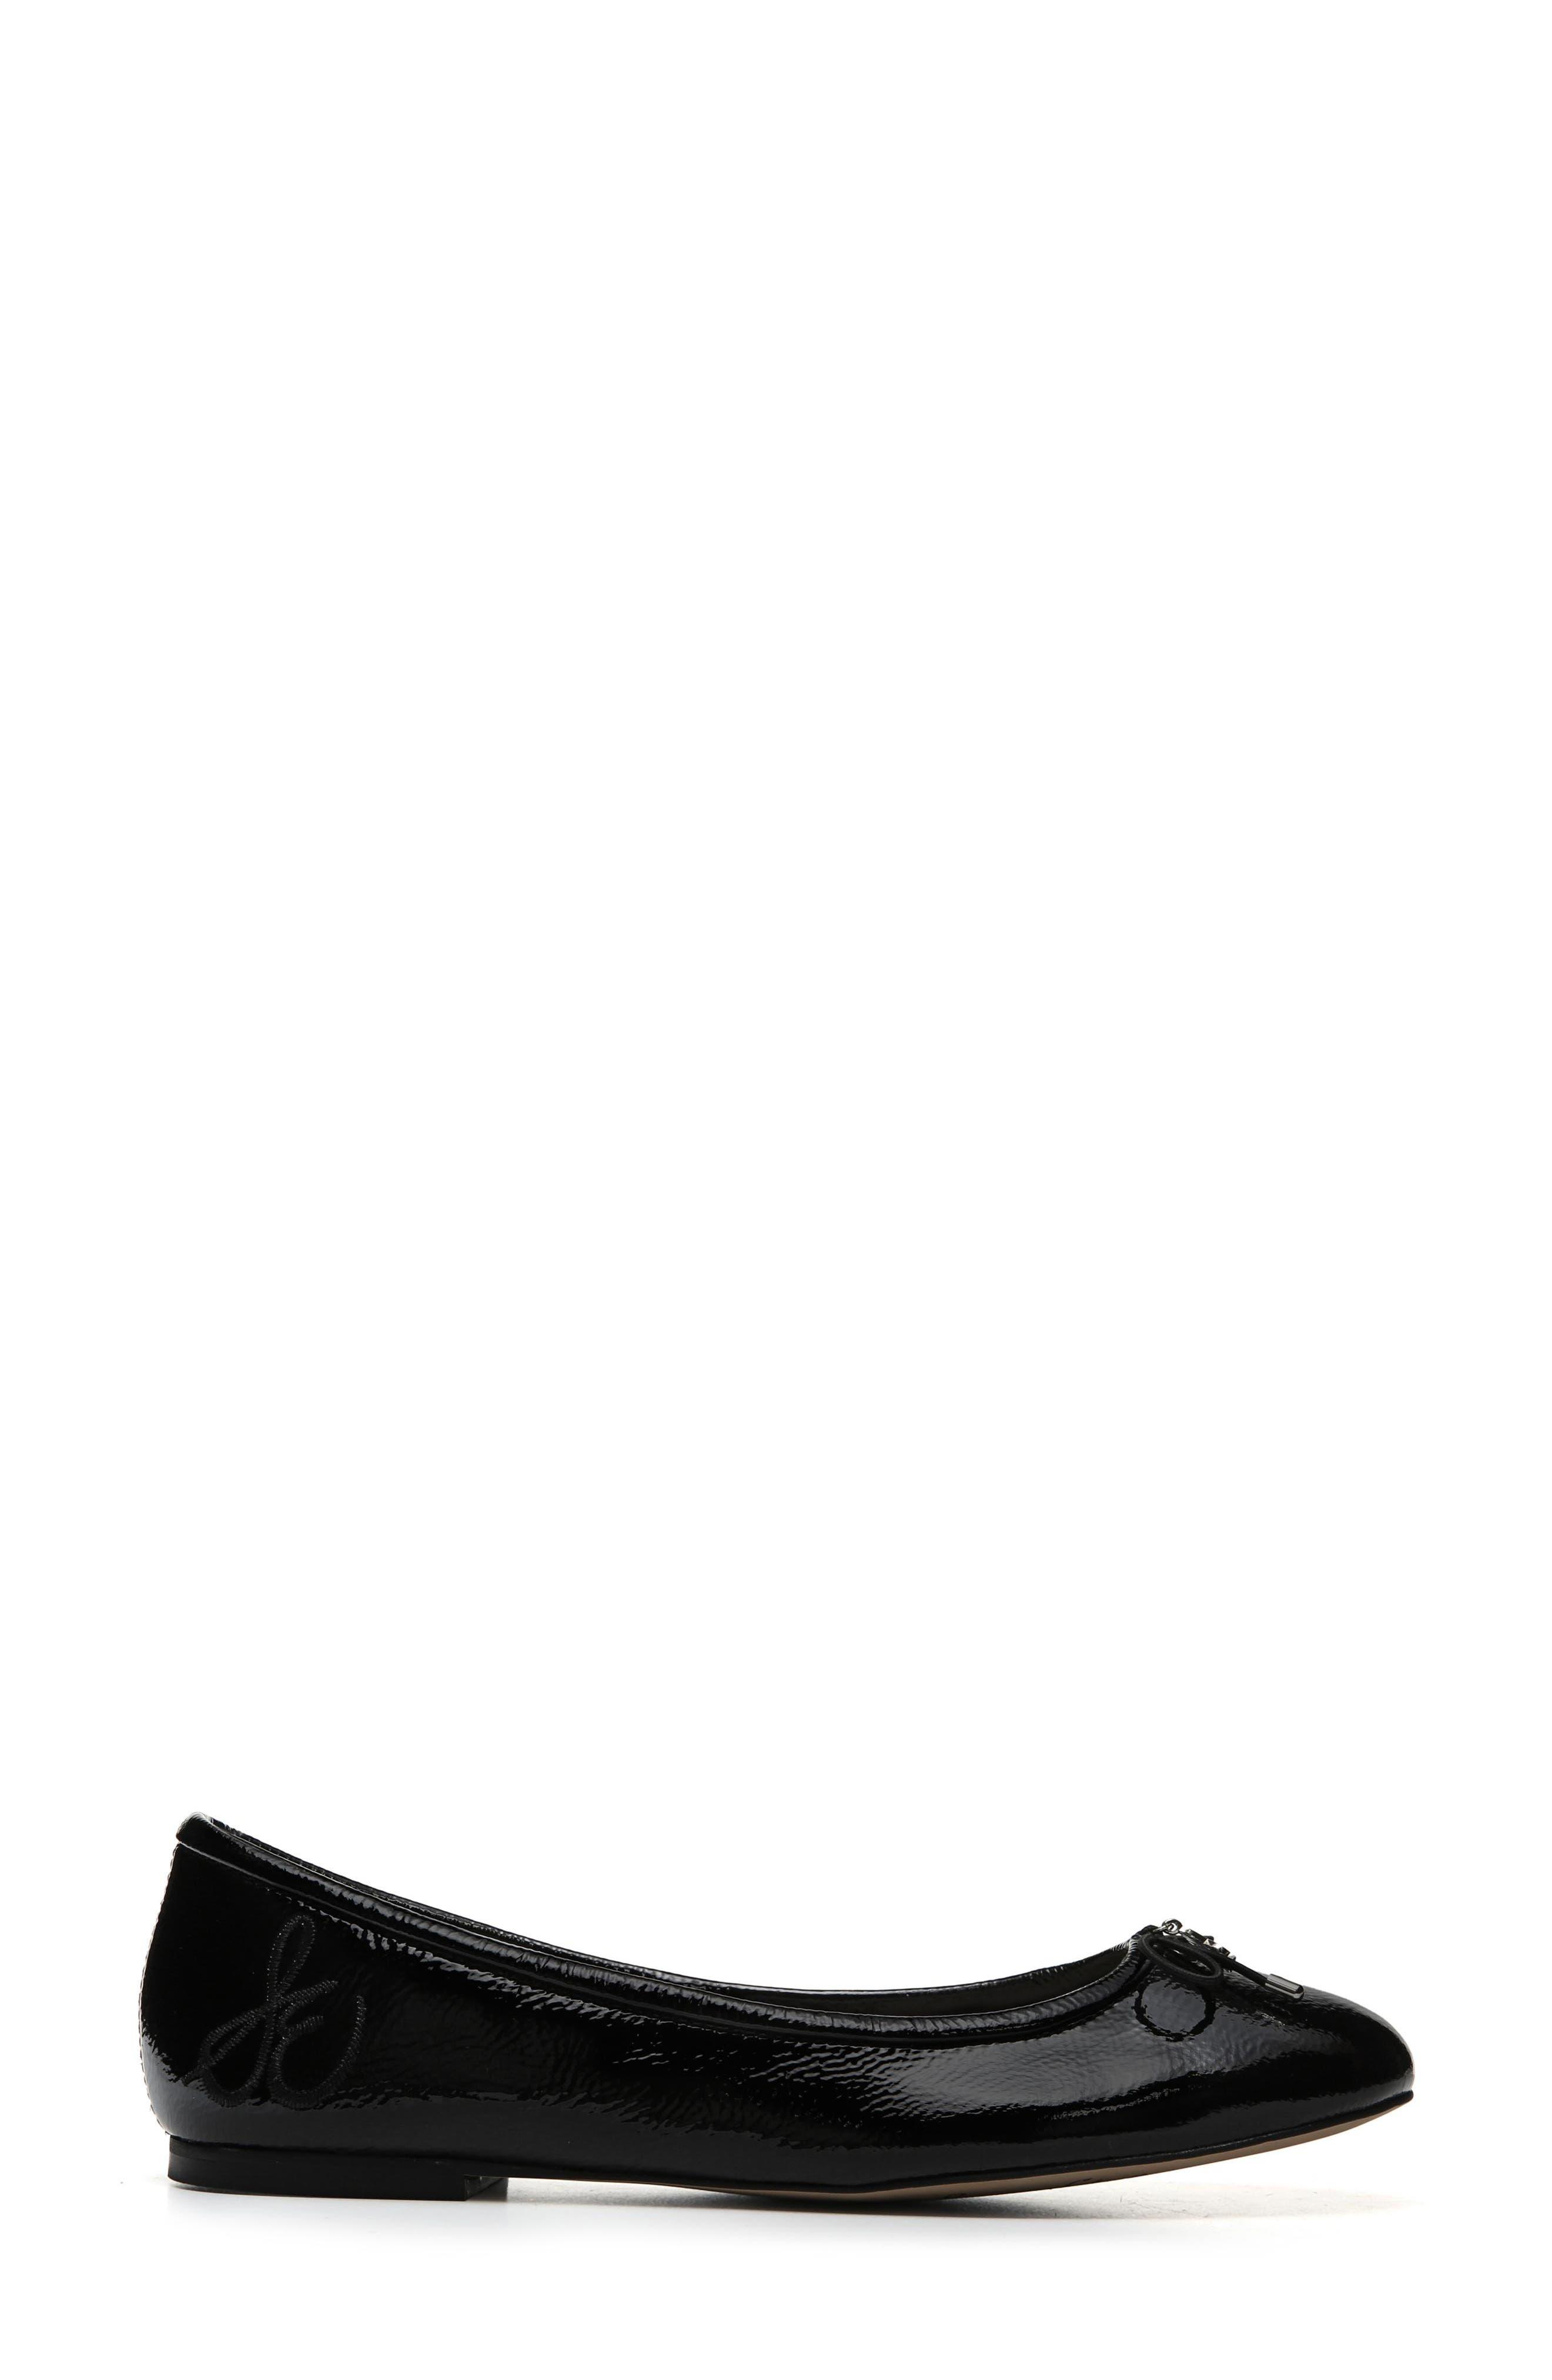 Felicia Flat,                             Alternate thumbnail 3, color,                             BLACK CRINKLE PATENT LEATHER